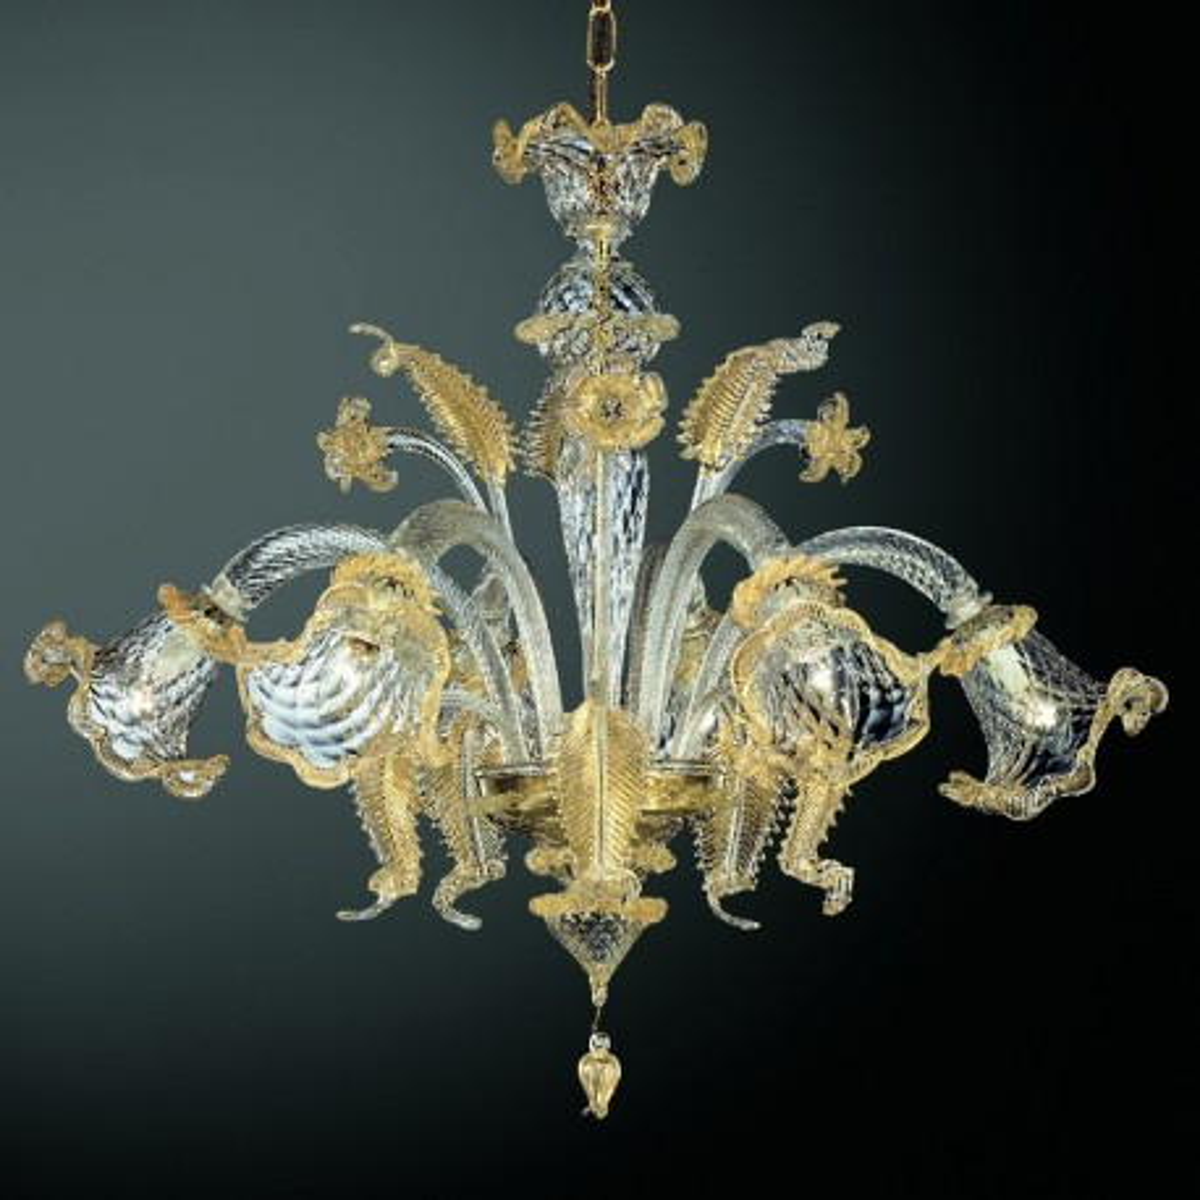 Canal Grande 6 luces lampara Murano oro transparente